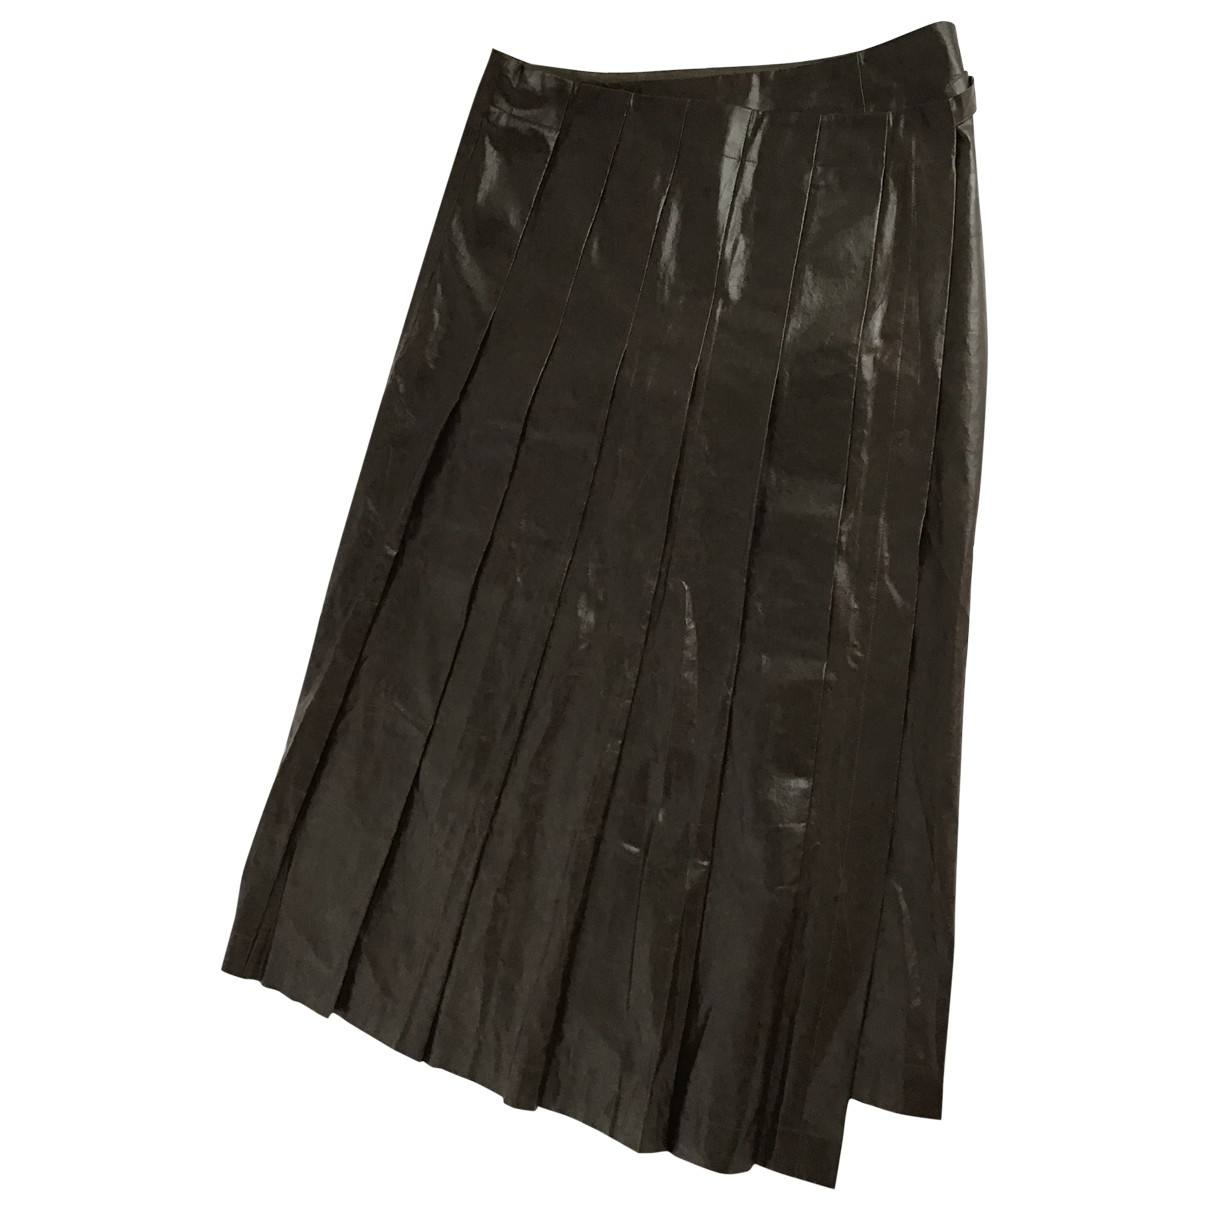 Junya Watanabe \N Brown skirt for Women M International